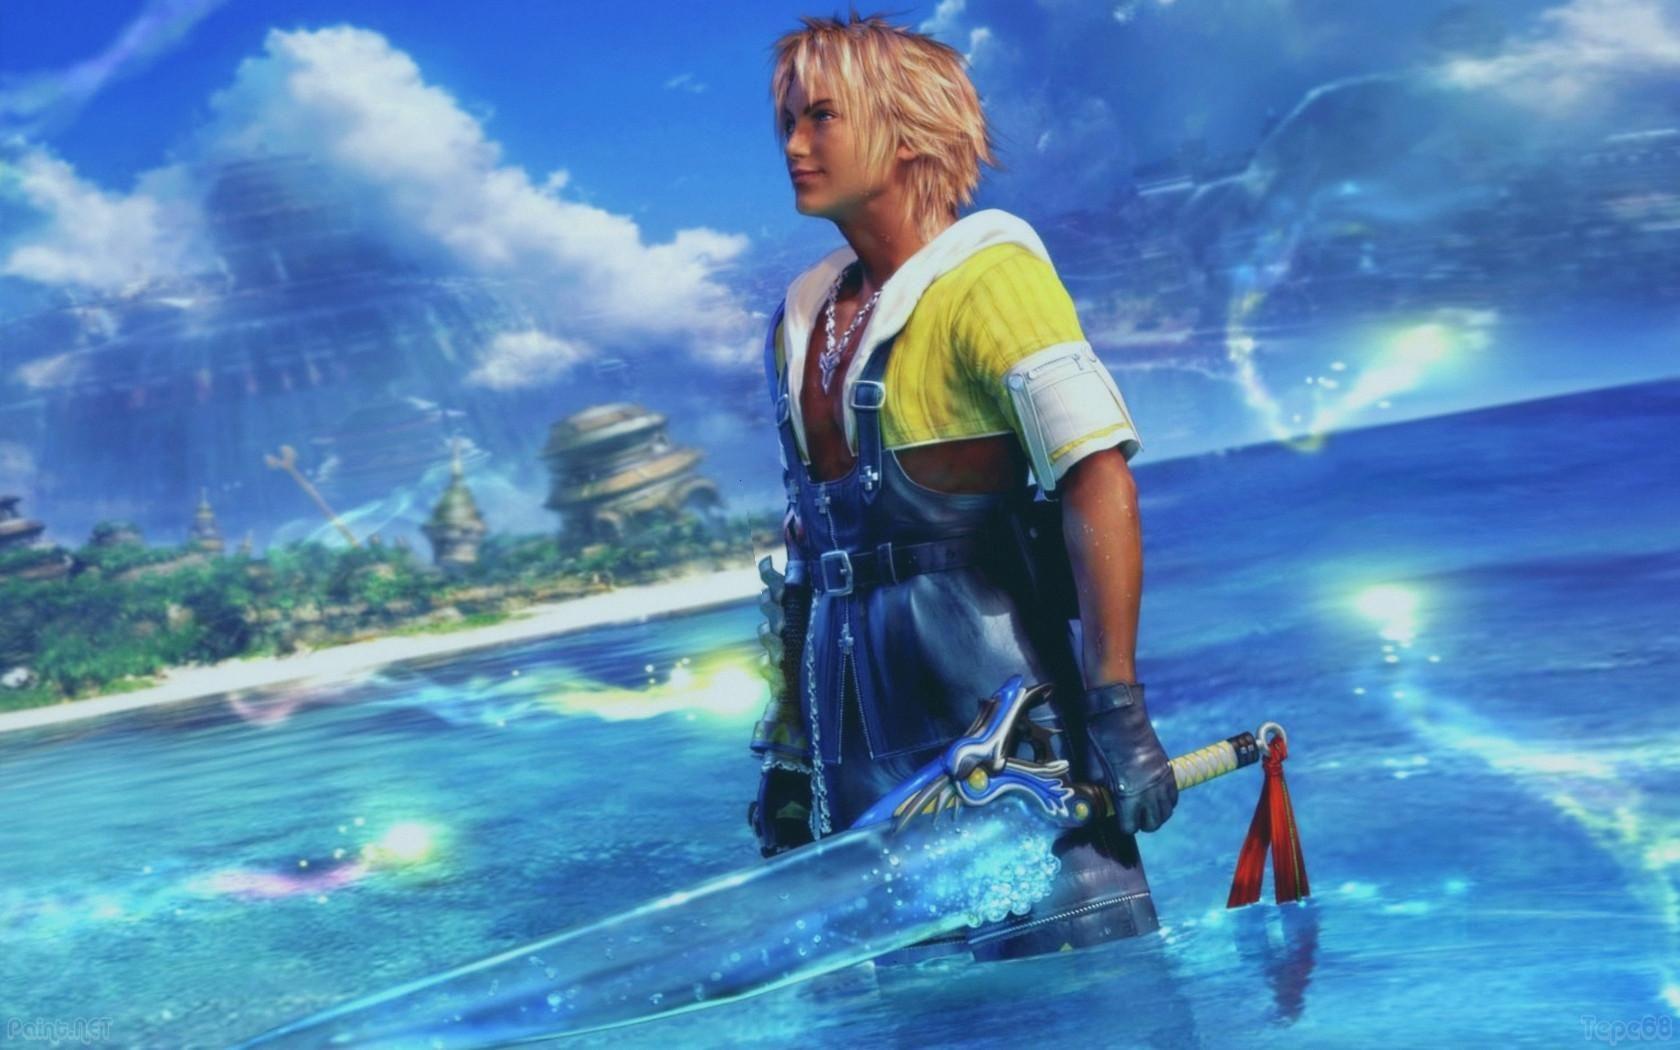 Final Fantasy X Wallpaper Hd Final Fantasy X Yuna Final Fantasy Final Fantasy